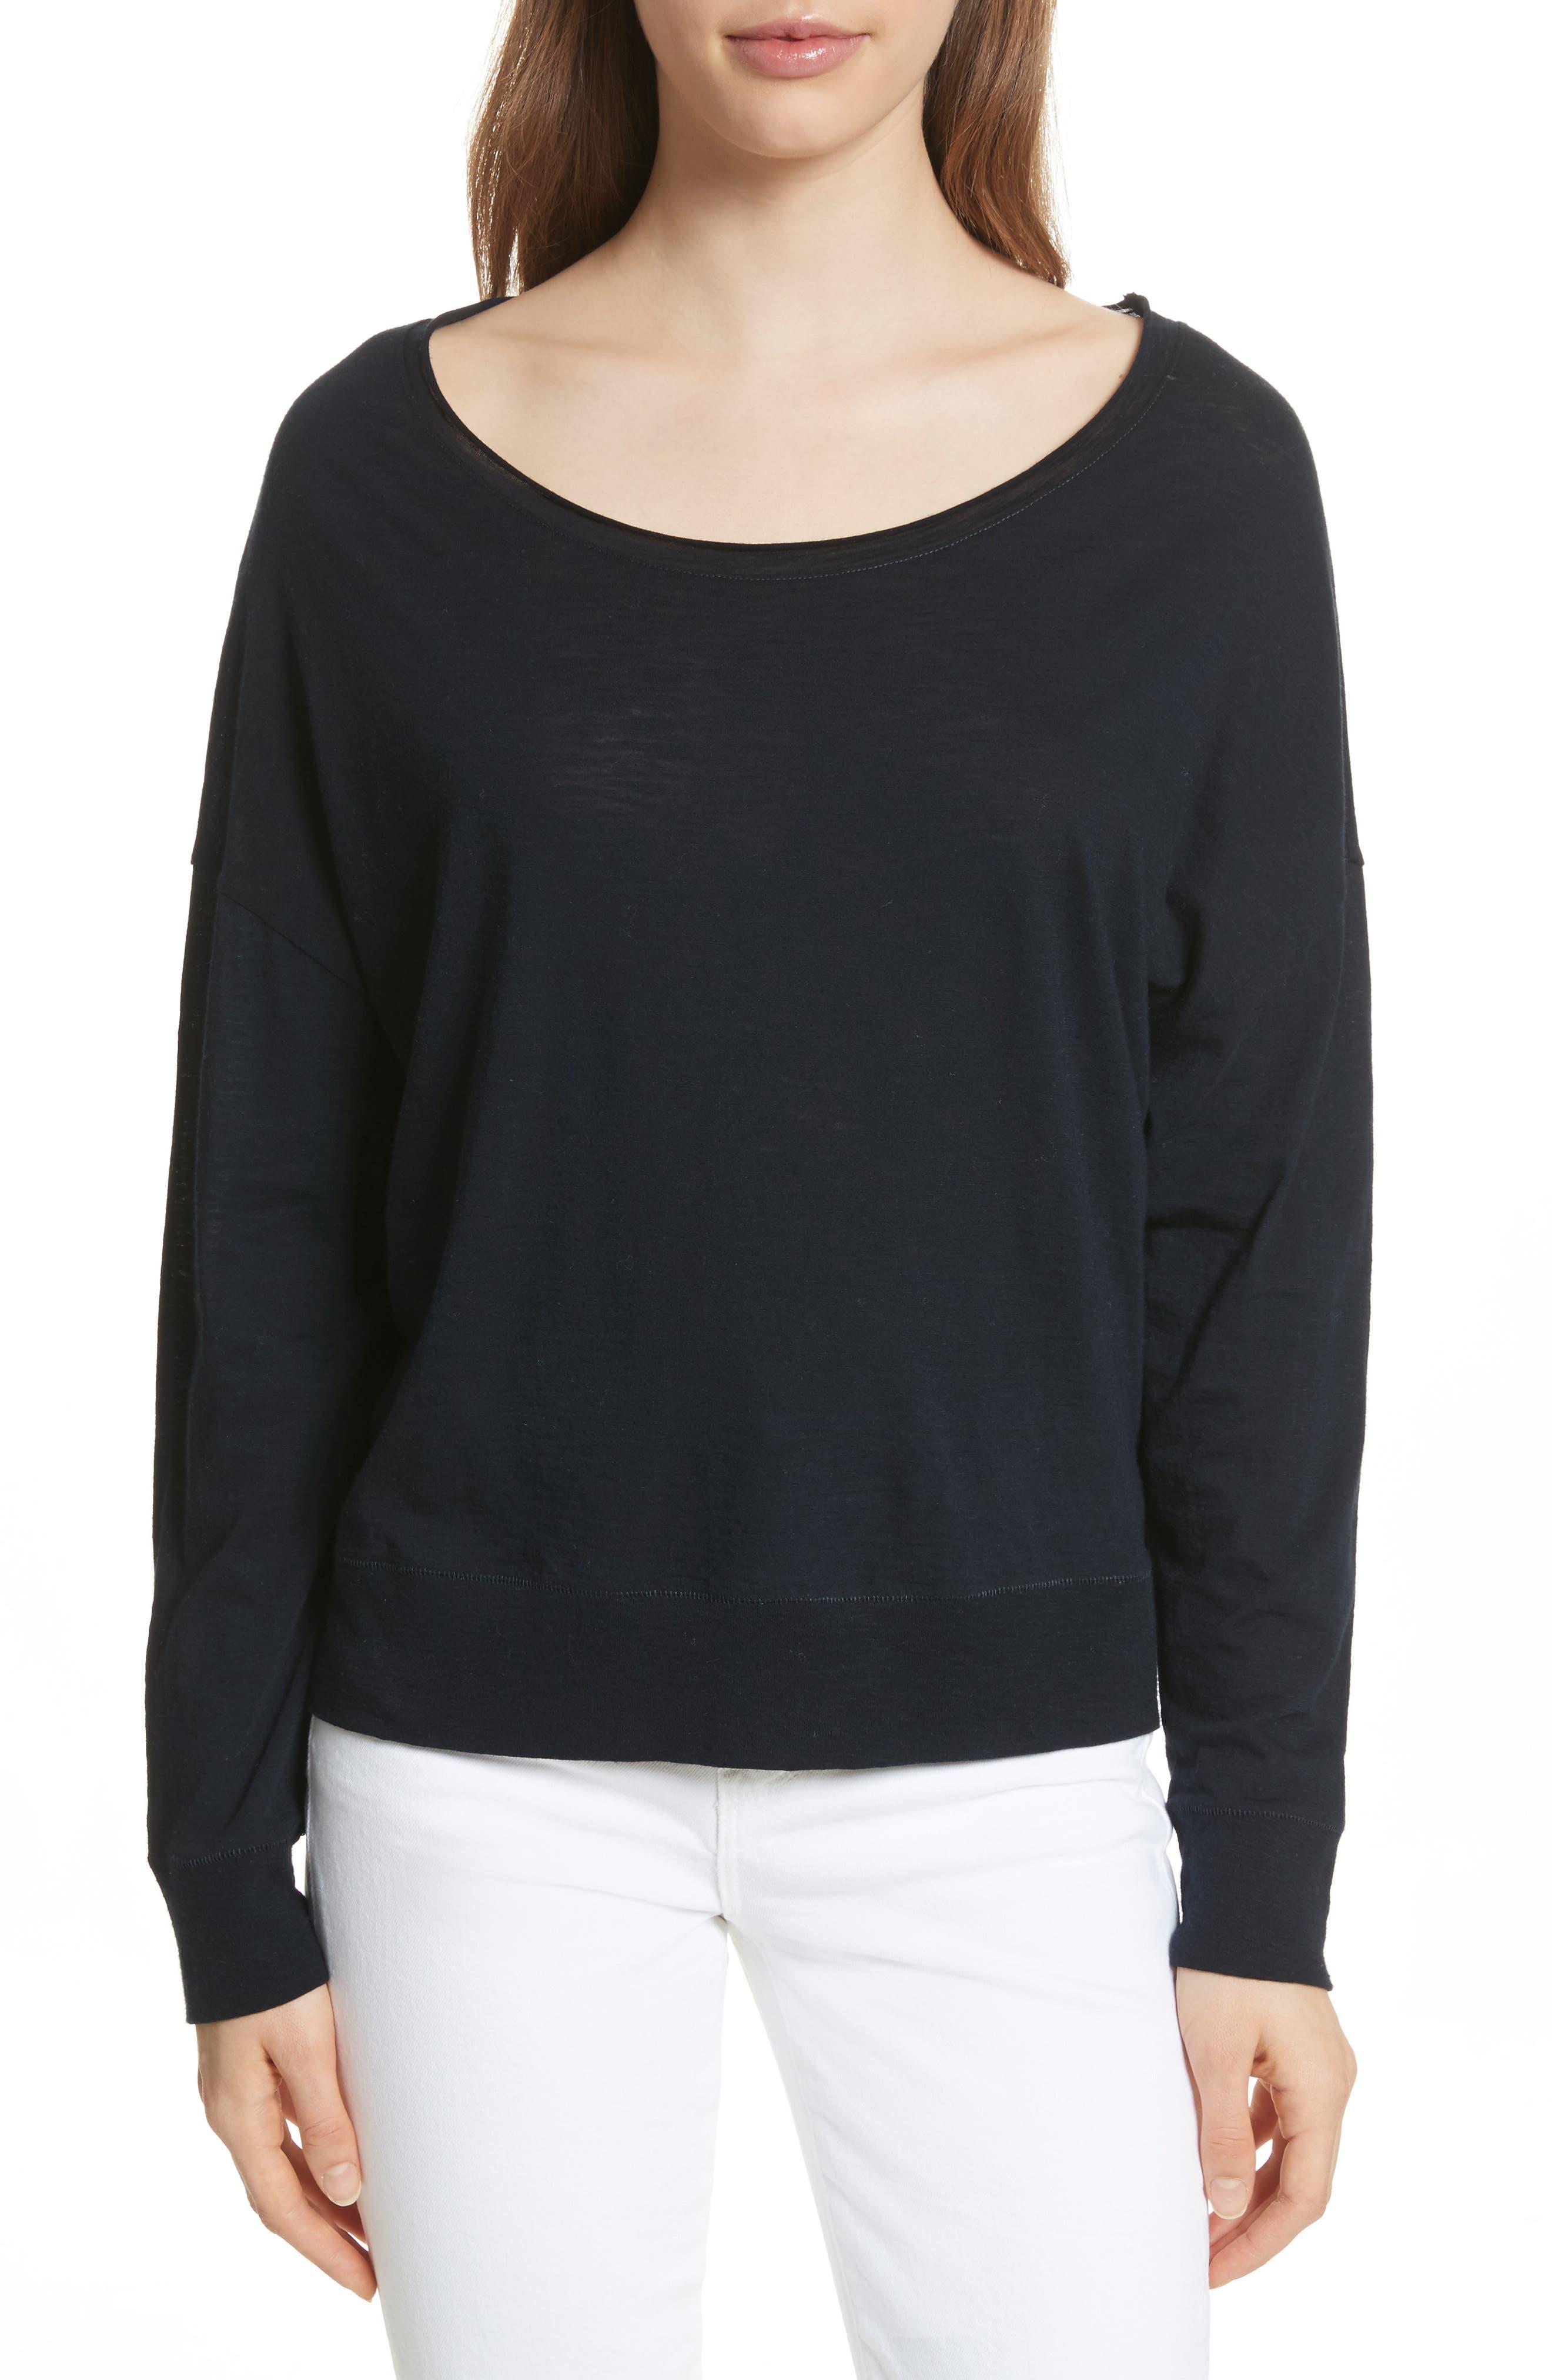 nike free 4 0 v2 womens cheap sweaters